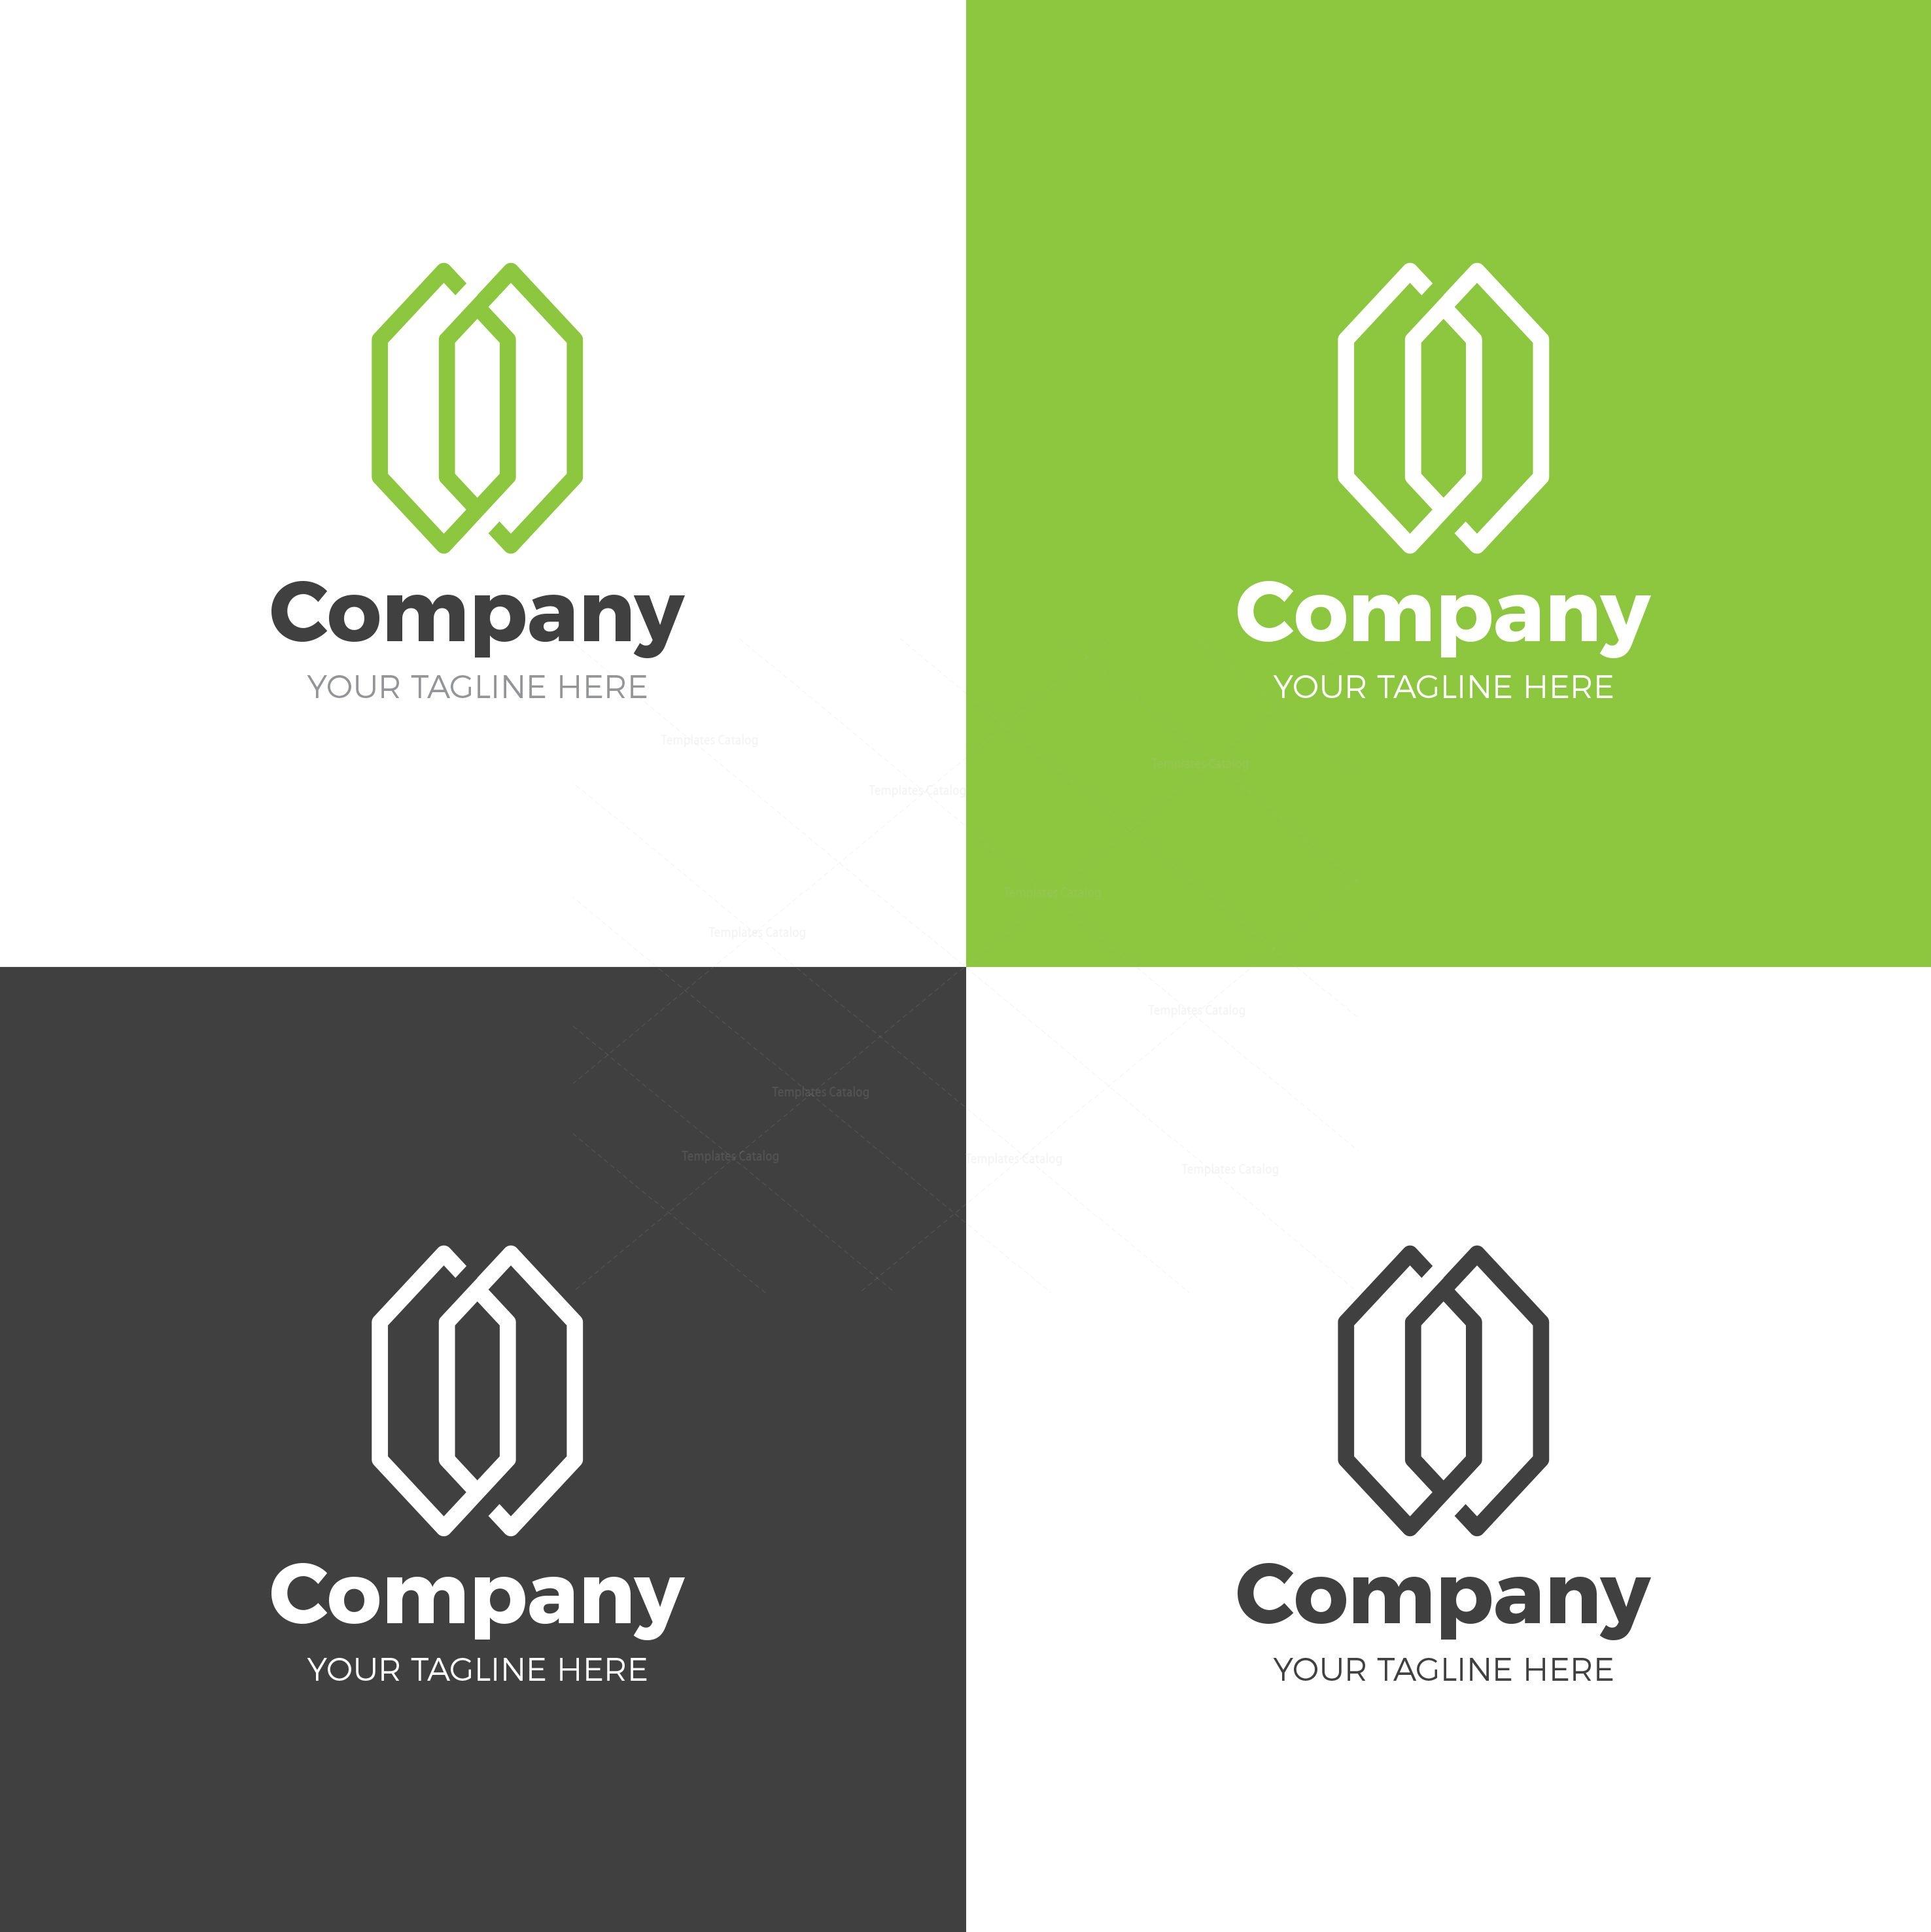 Simple Creative Logo Design Template 001893 - Template Catalog - photo#26